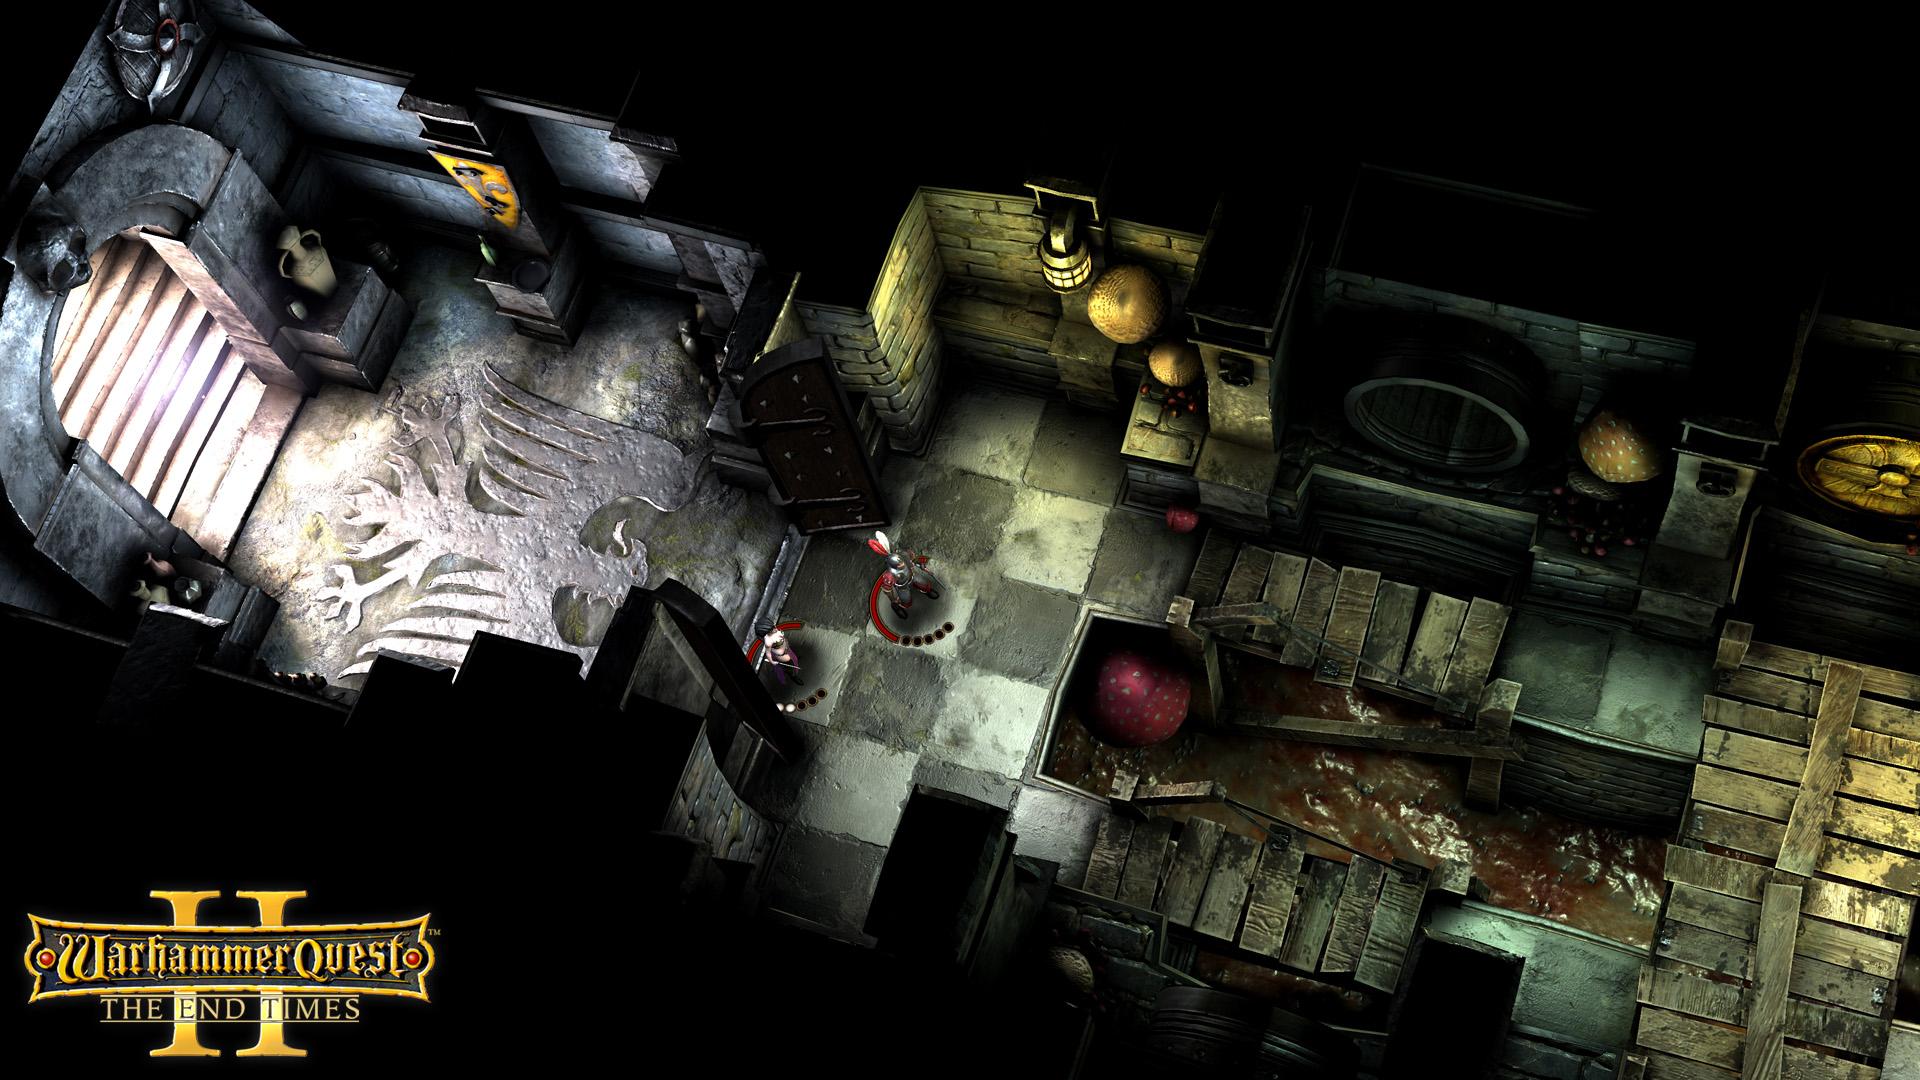 Na podzim oznámen Warhammer Quest 2 140577